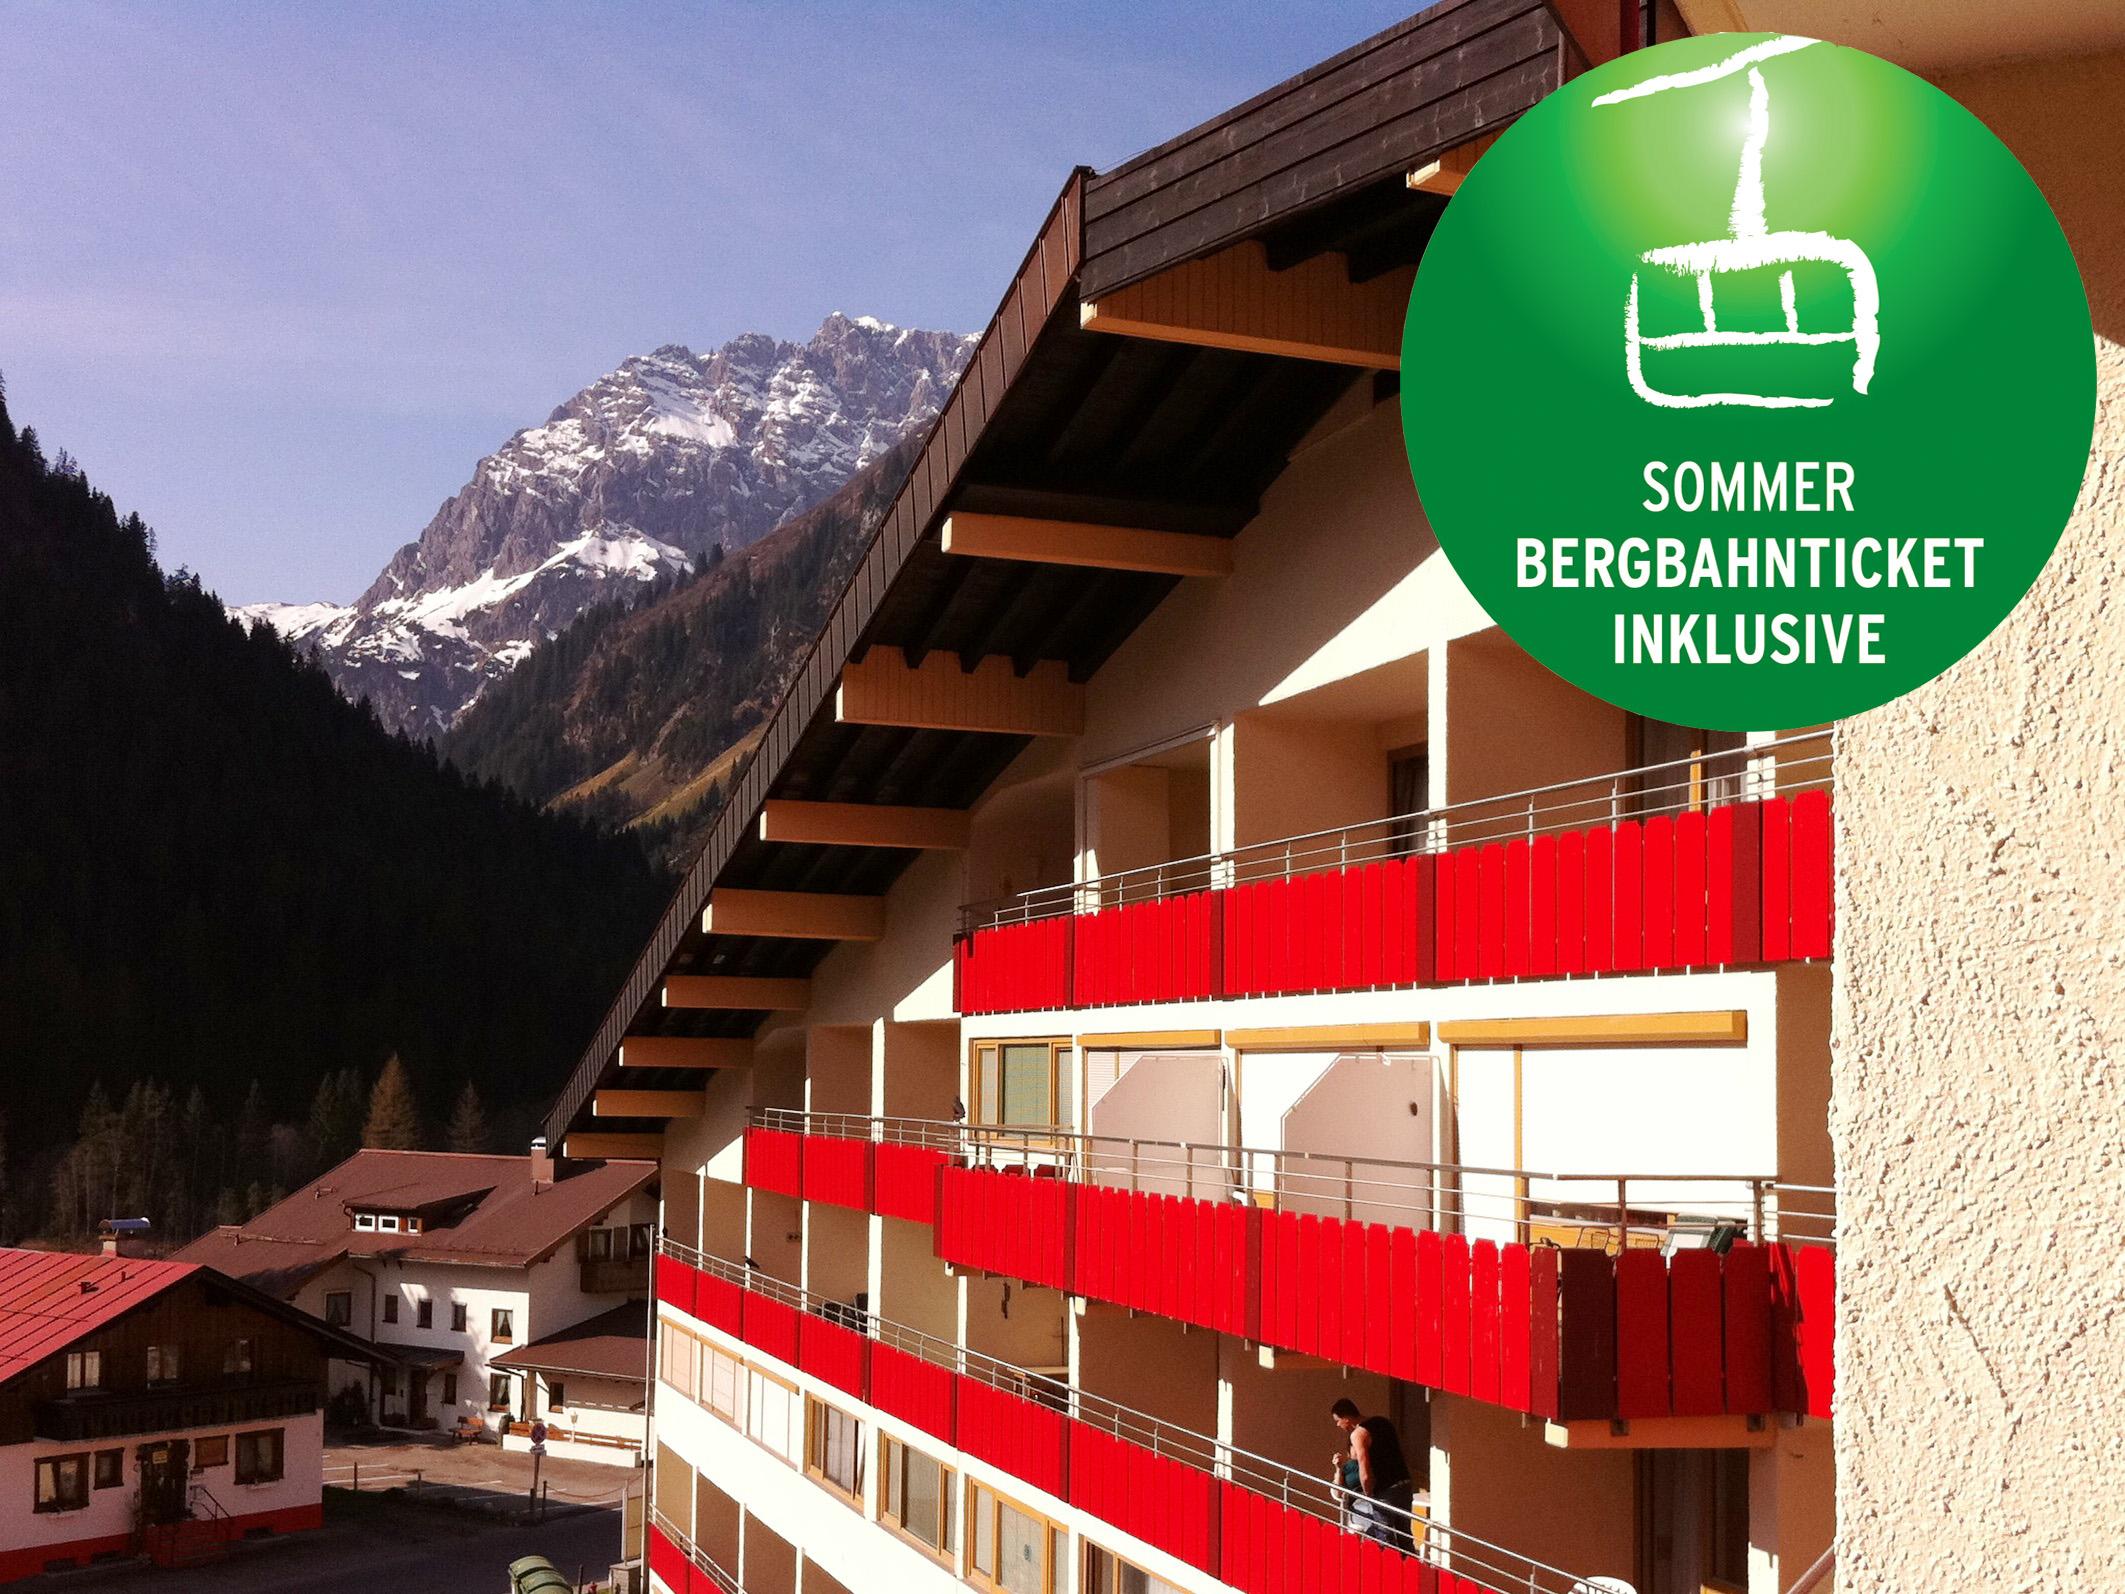 Aparthotel Bergbahnticket